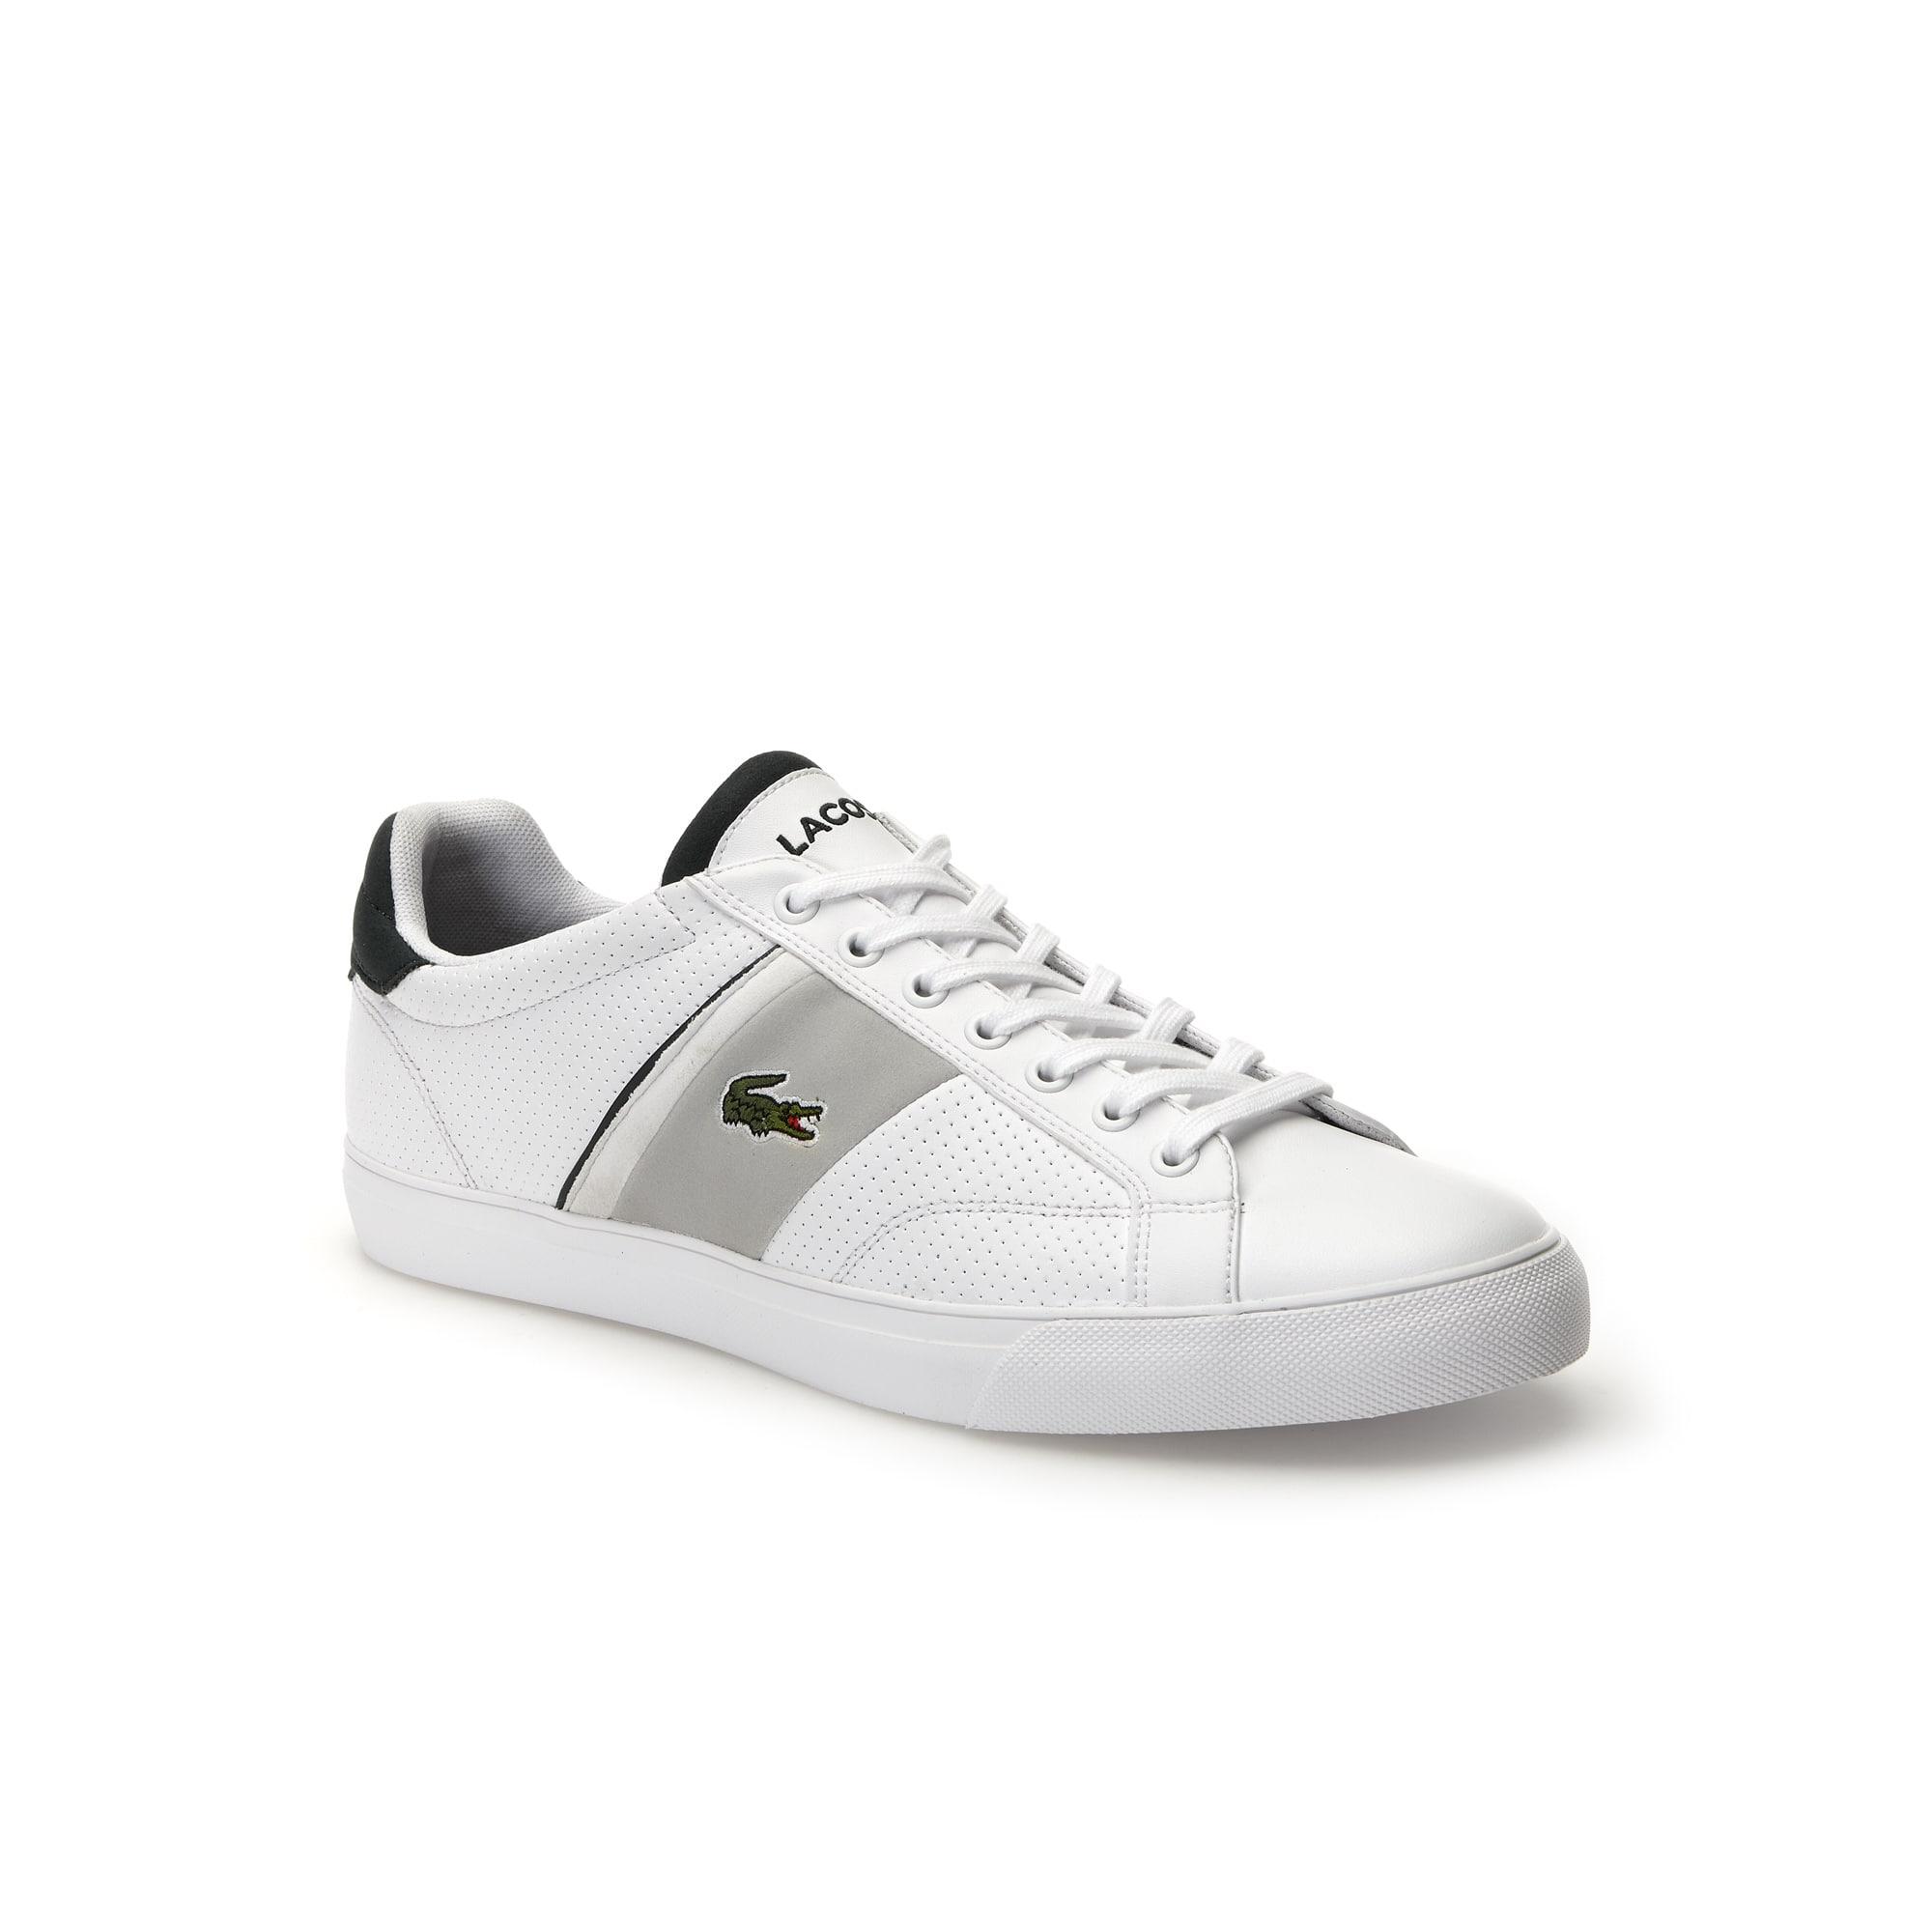 Sneakers Fairlead in pelle